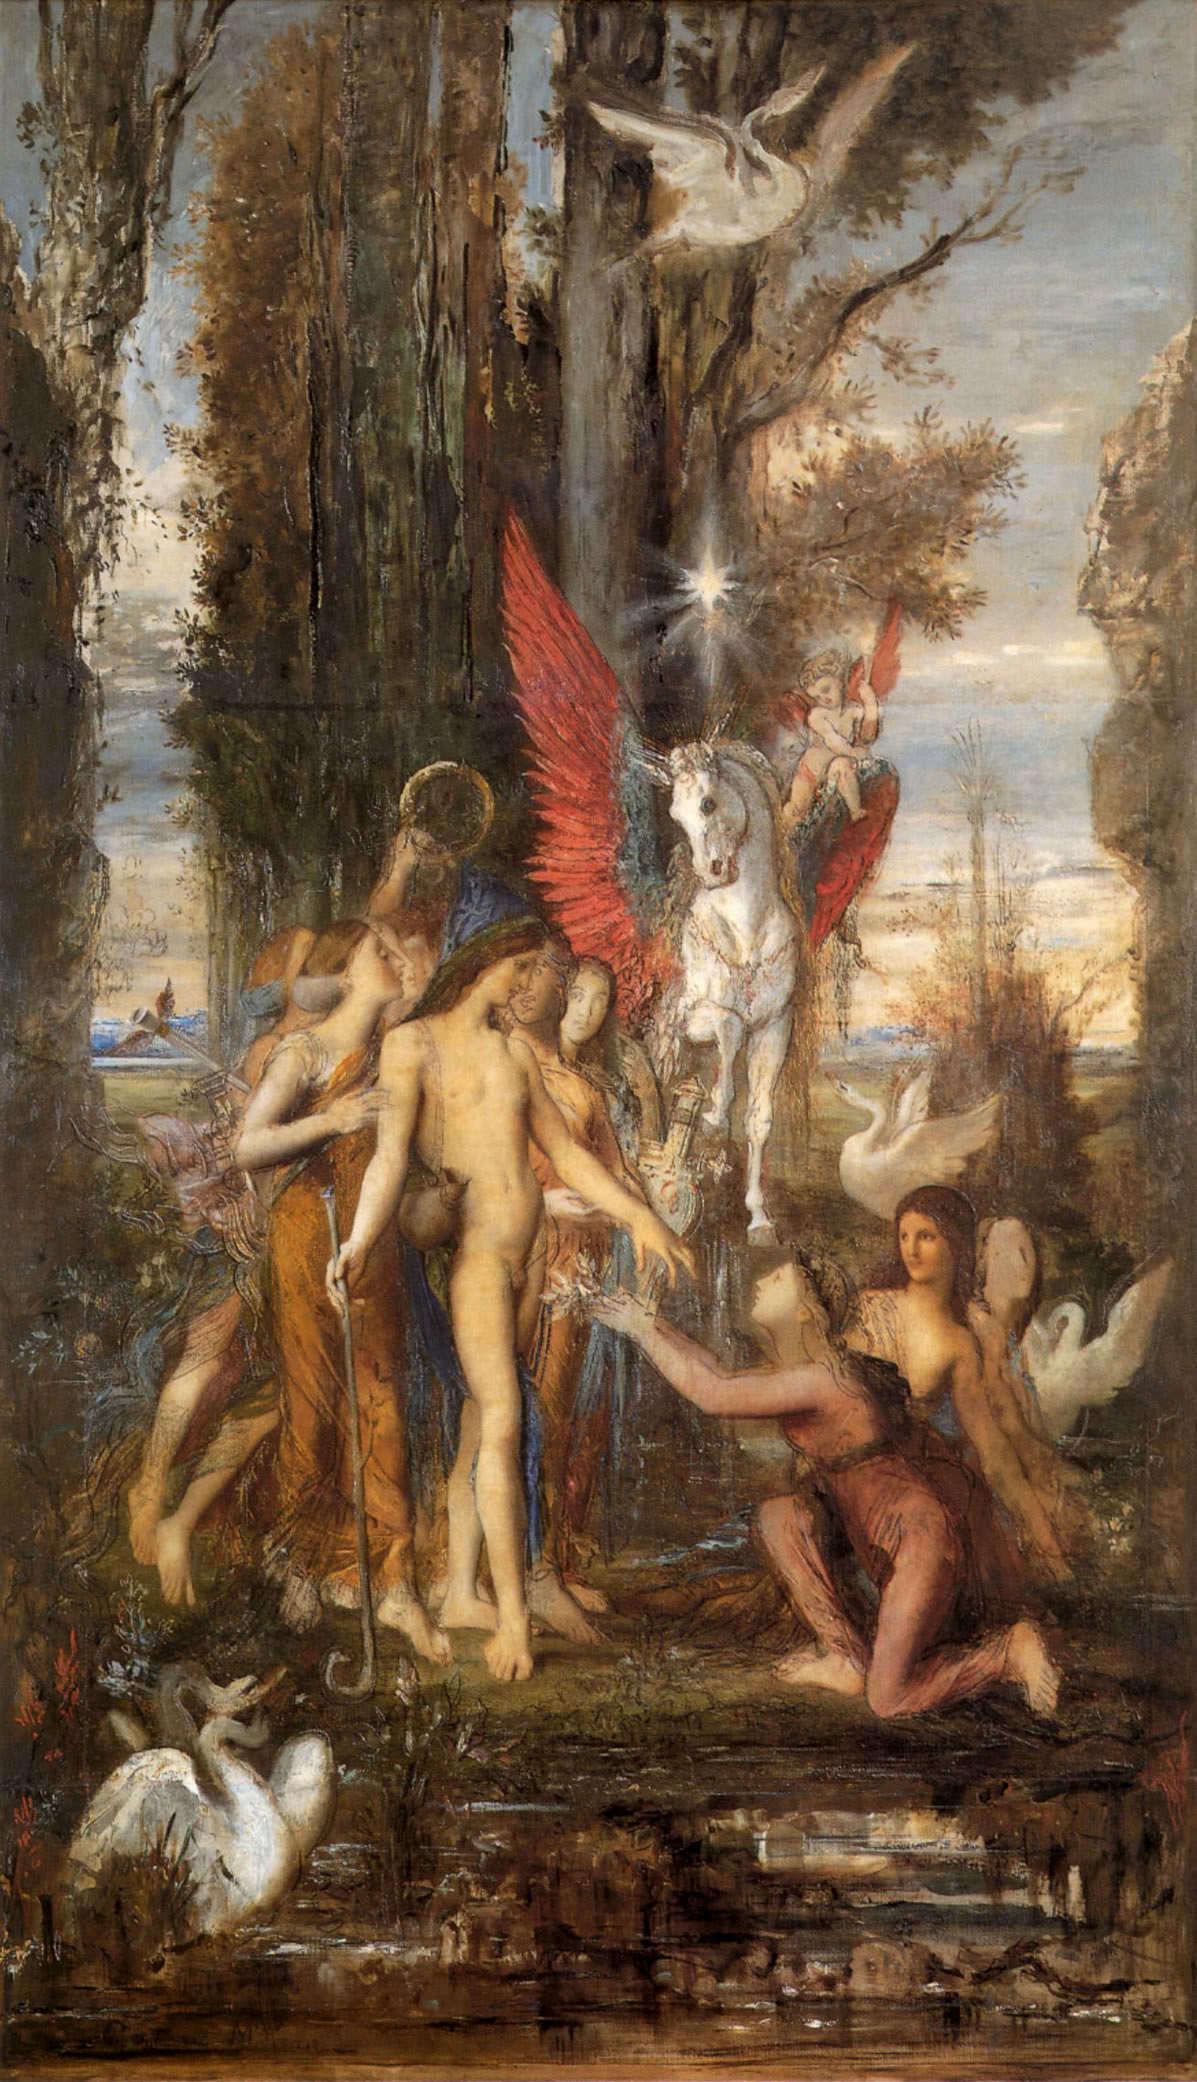 1860_Гесиод и музы (155 х 236 см) (Париж, Музей Гюстава Моро)